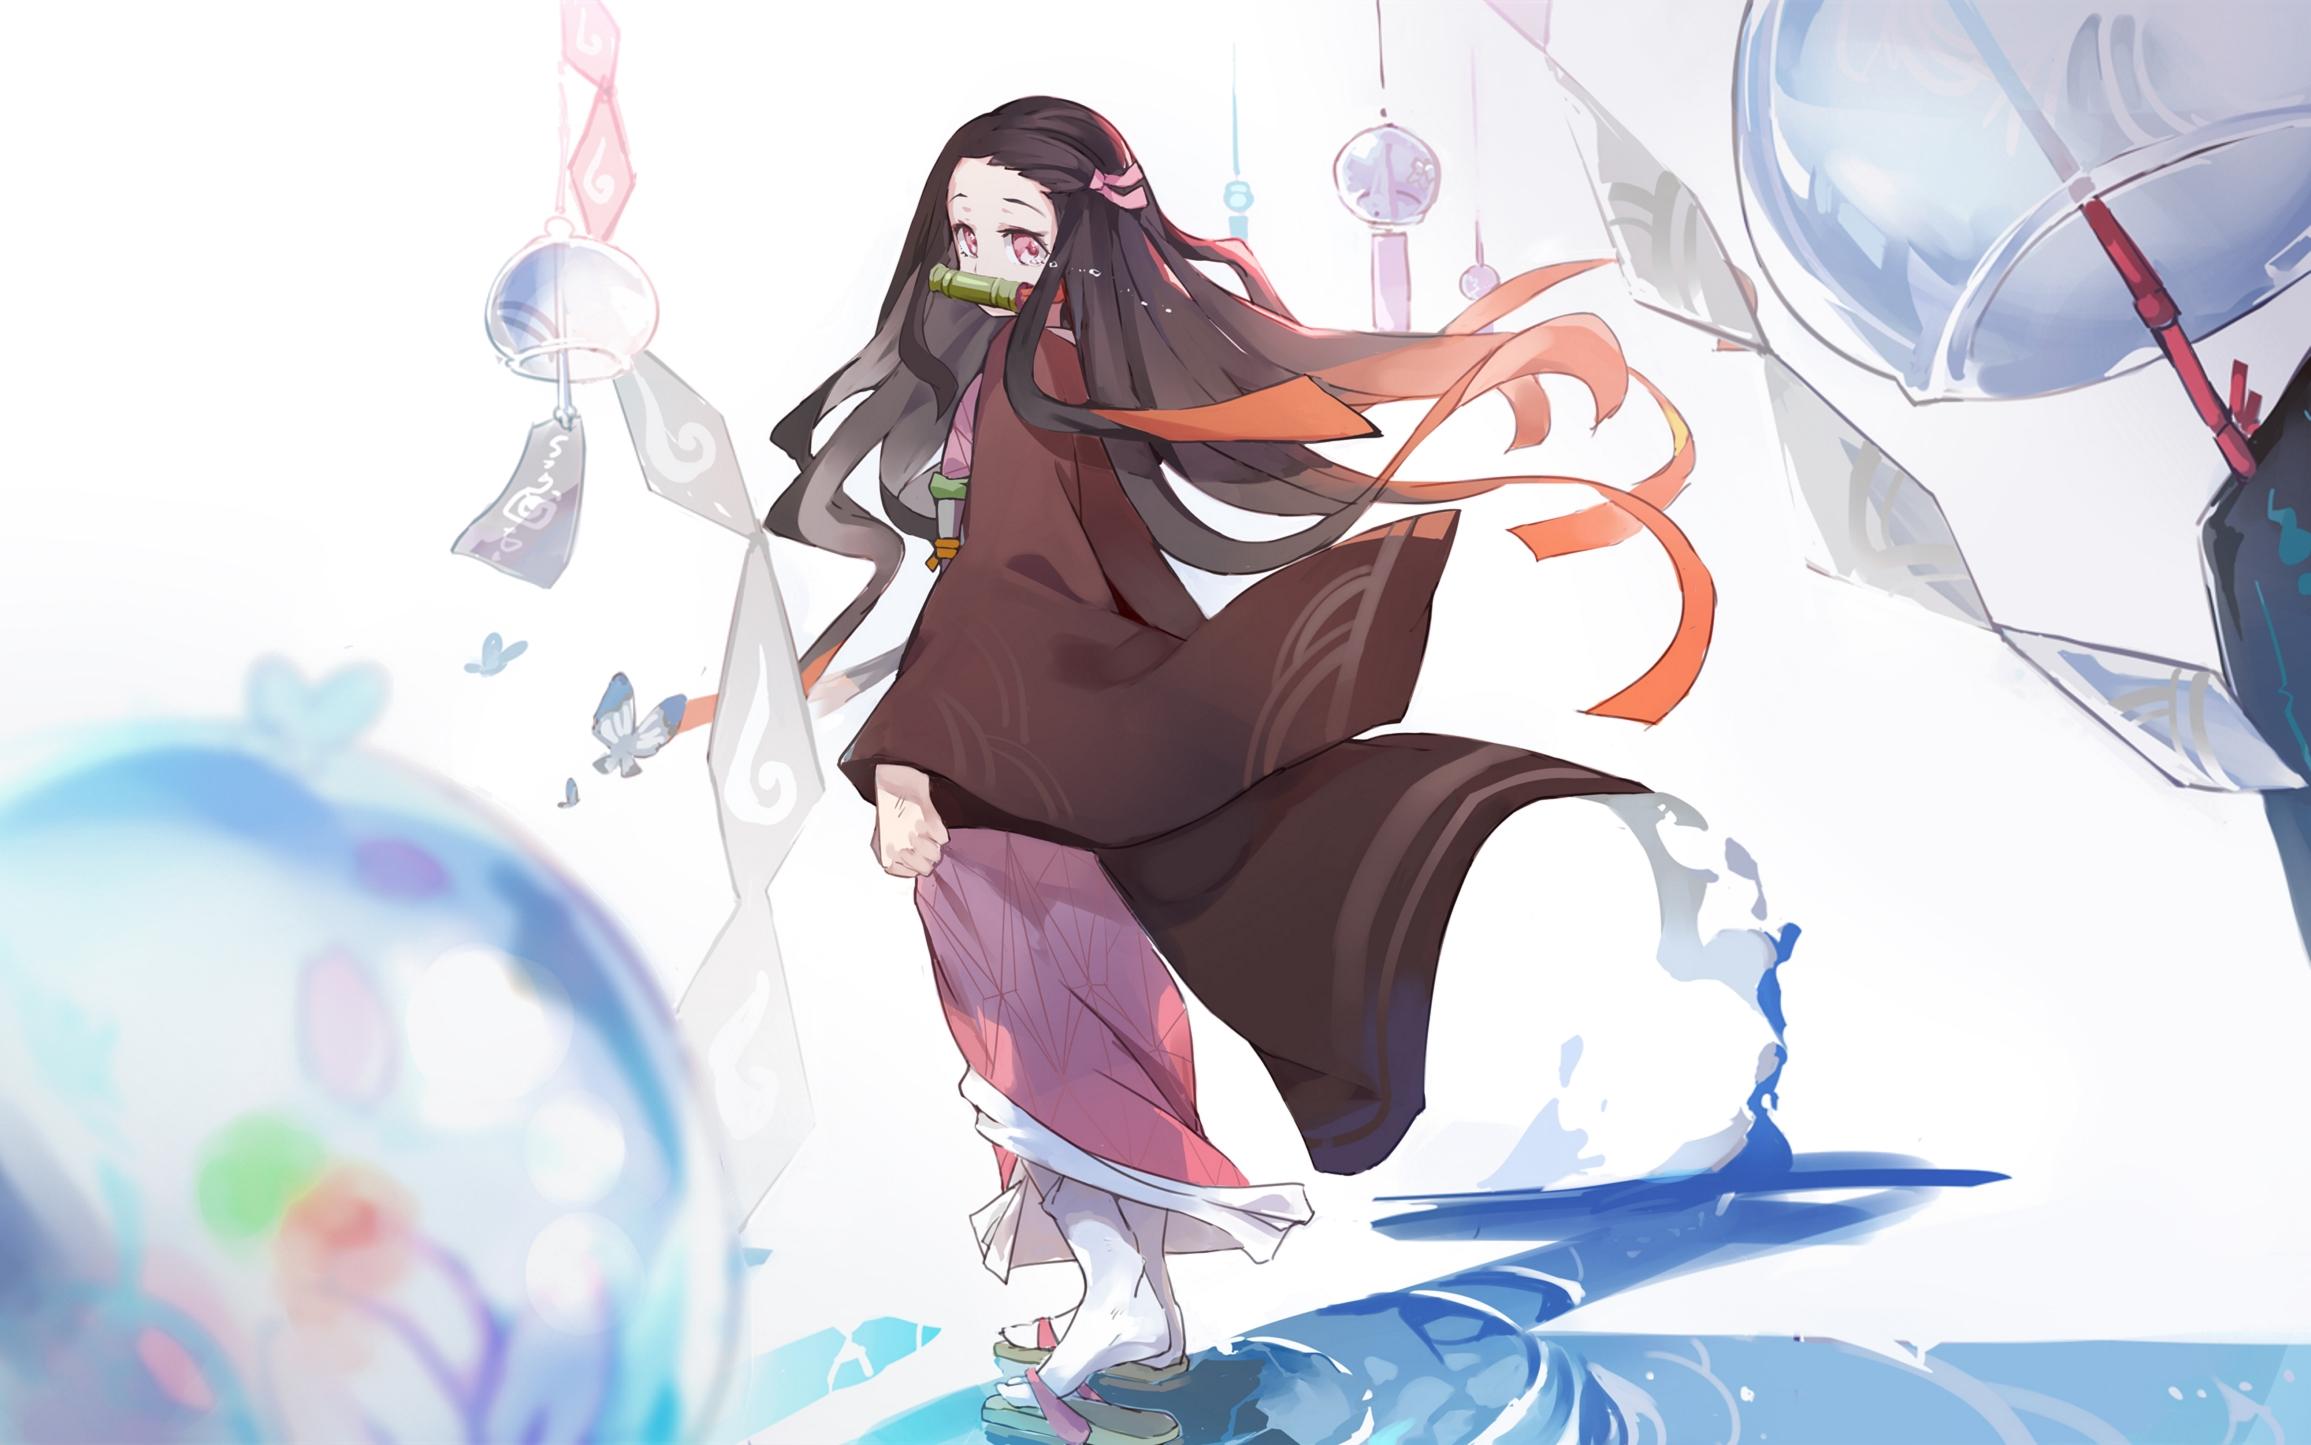 Free download Demon Slayer Kimetsu no Yaiba HD Wallpaper Background Image 2311x1445 for your ...